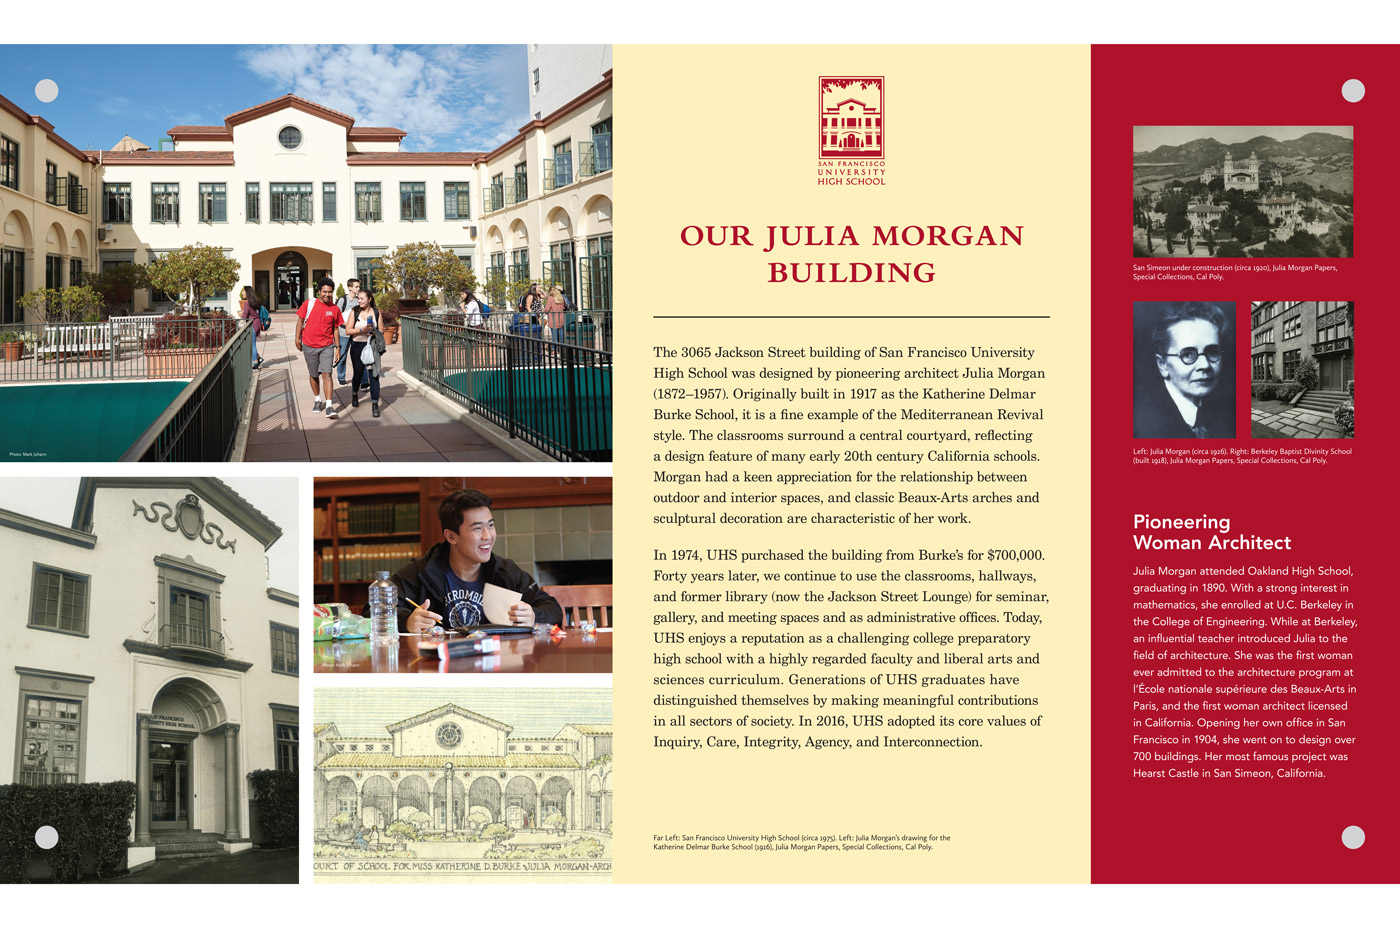 San Francisco University High School Julia Morgan Building